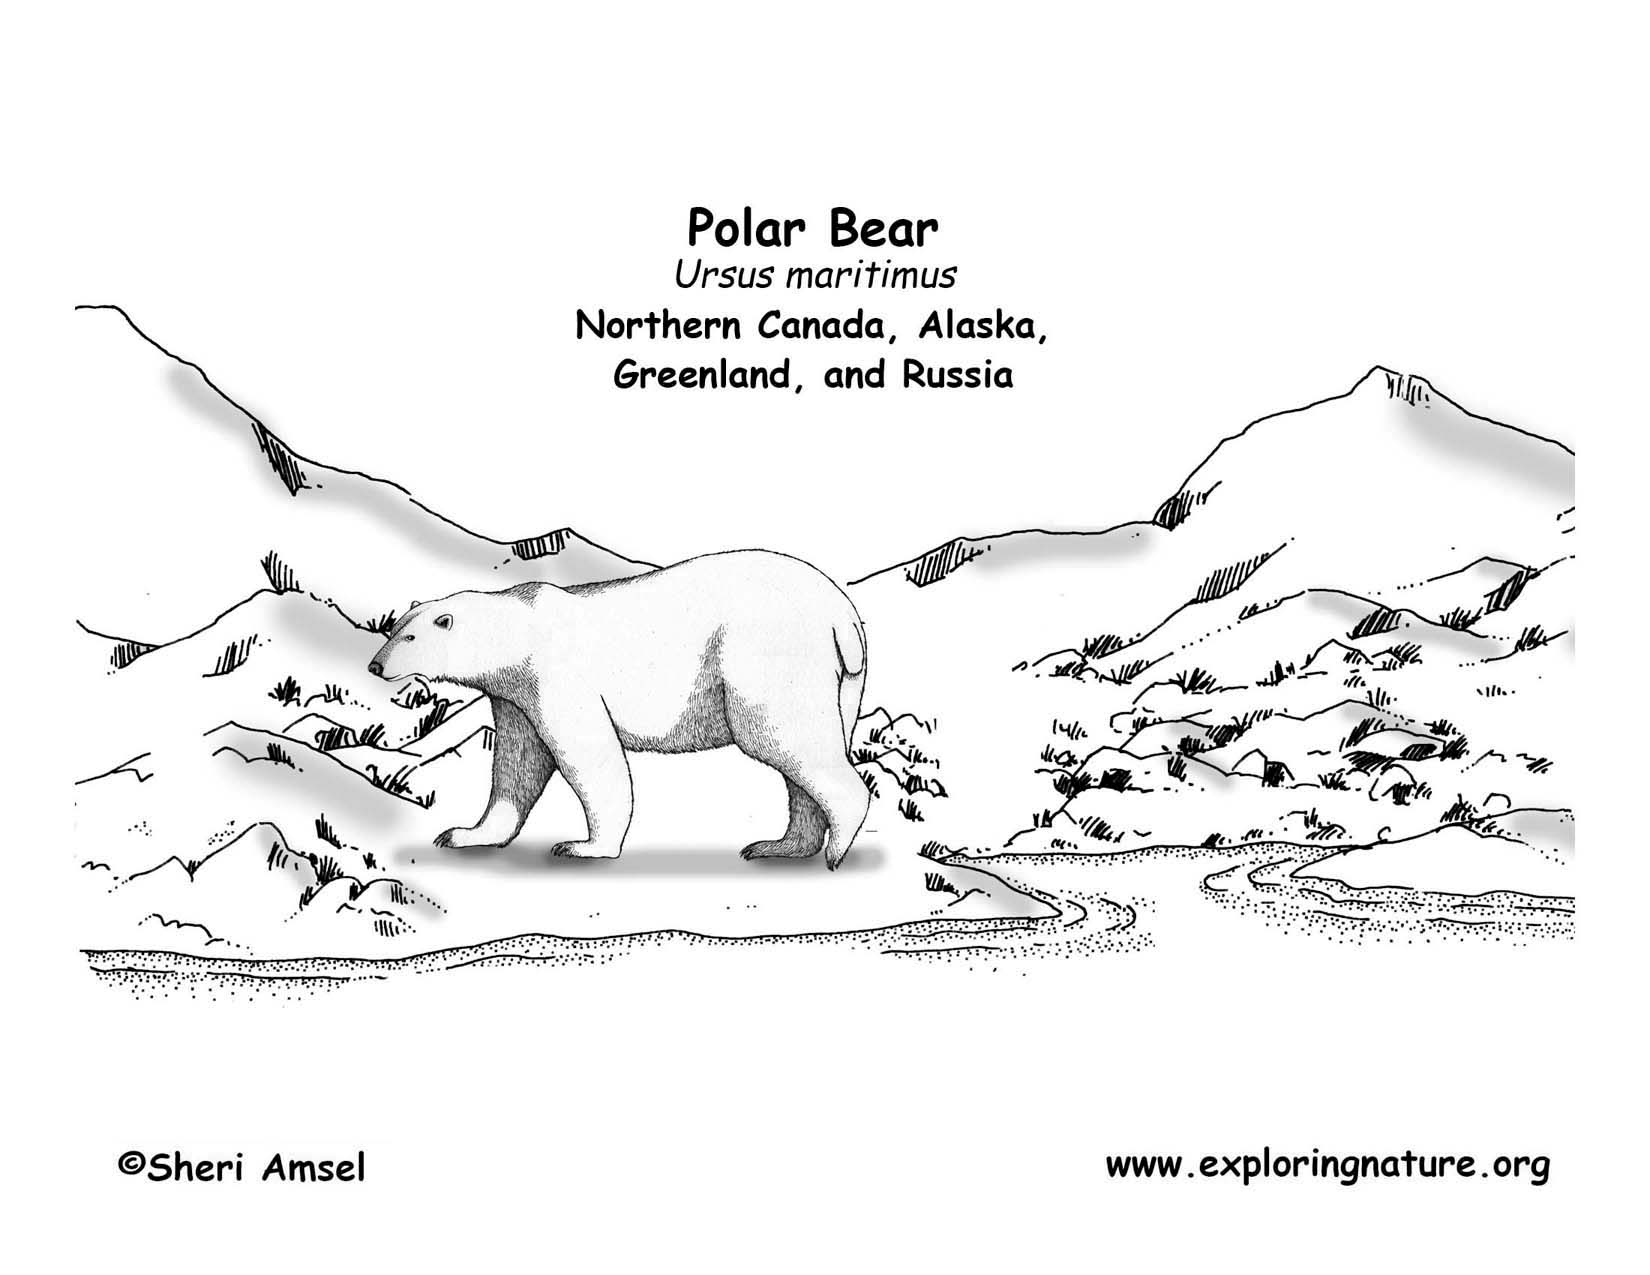 polar bear diagram john deere 445 wiring unique realestateradio exploring nature educational resource error